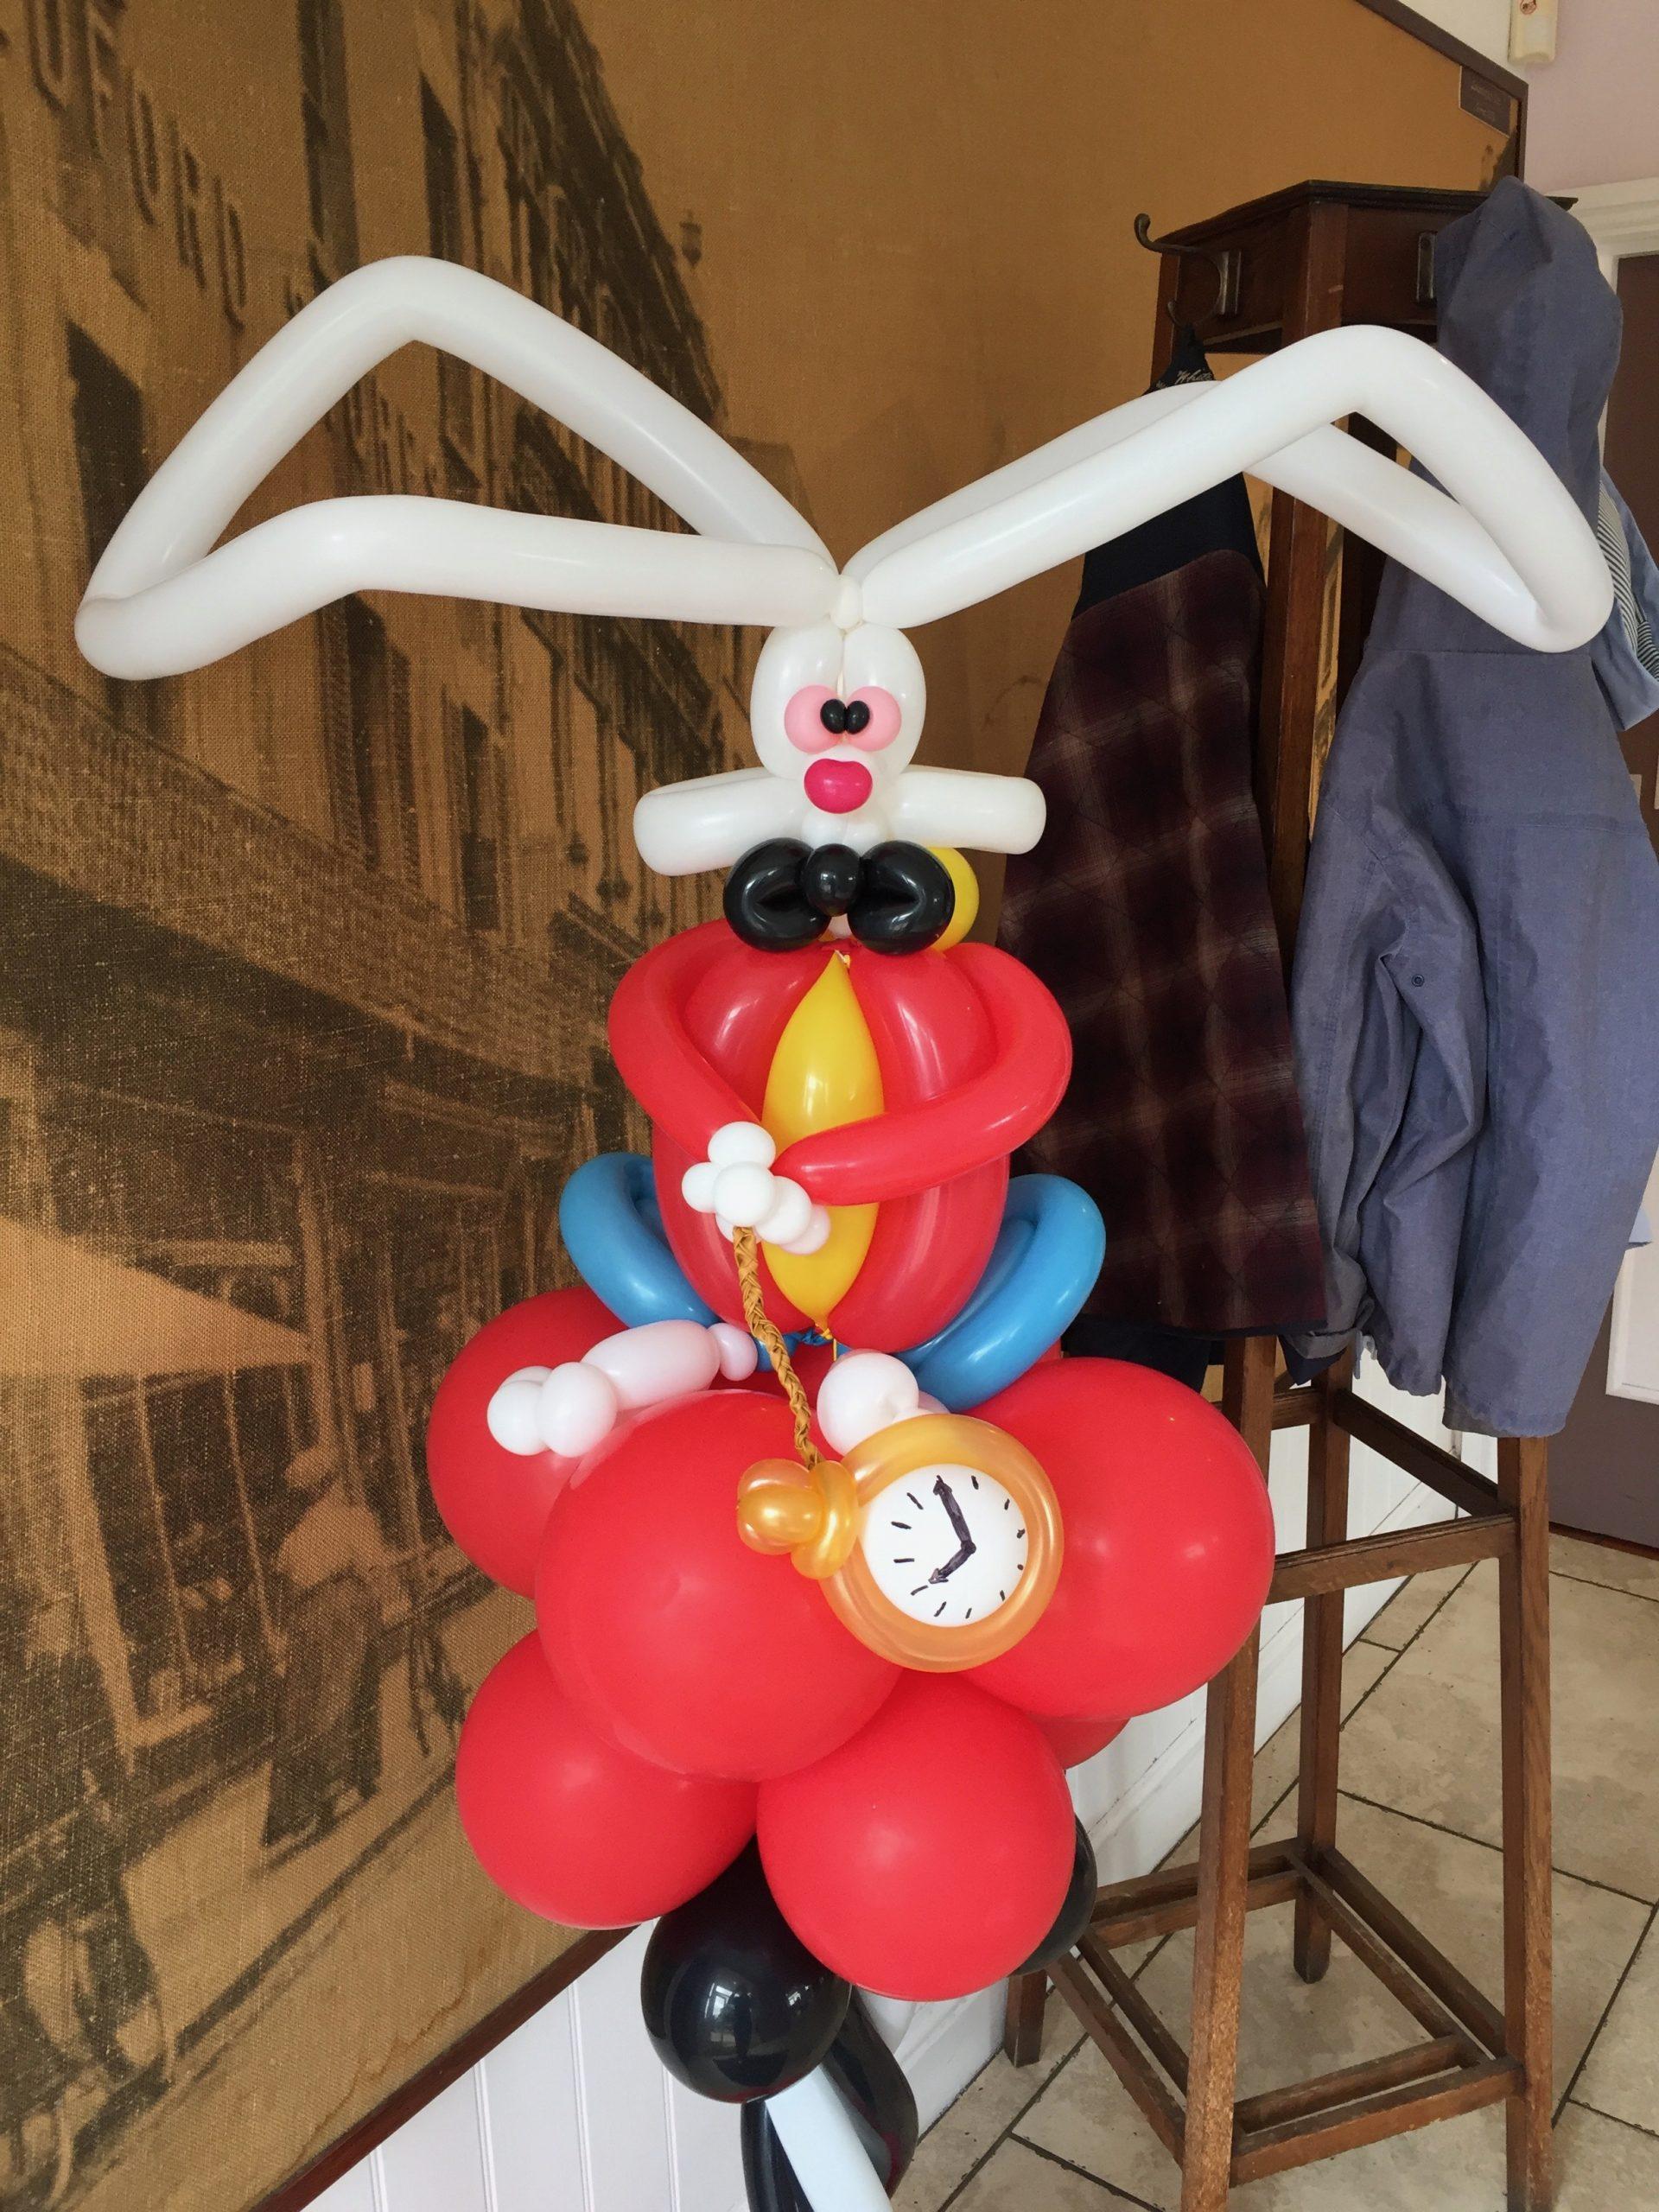 Balloon white rabbit